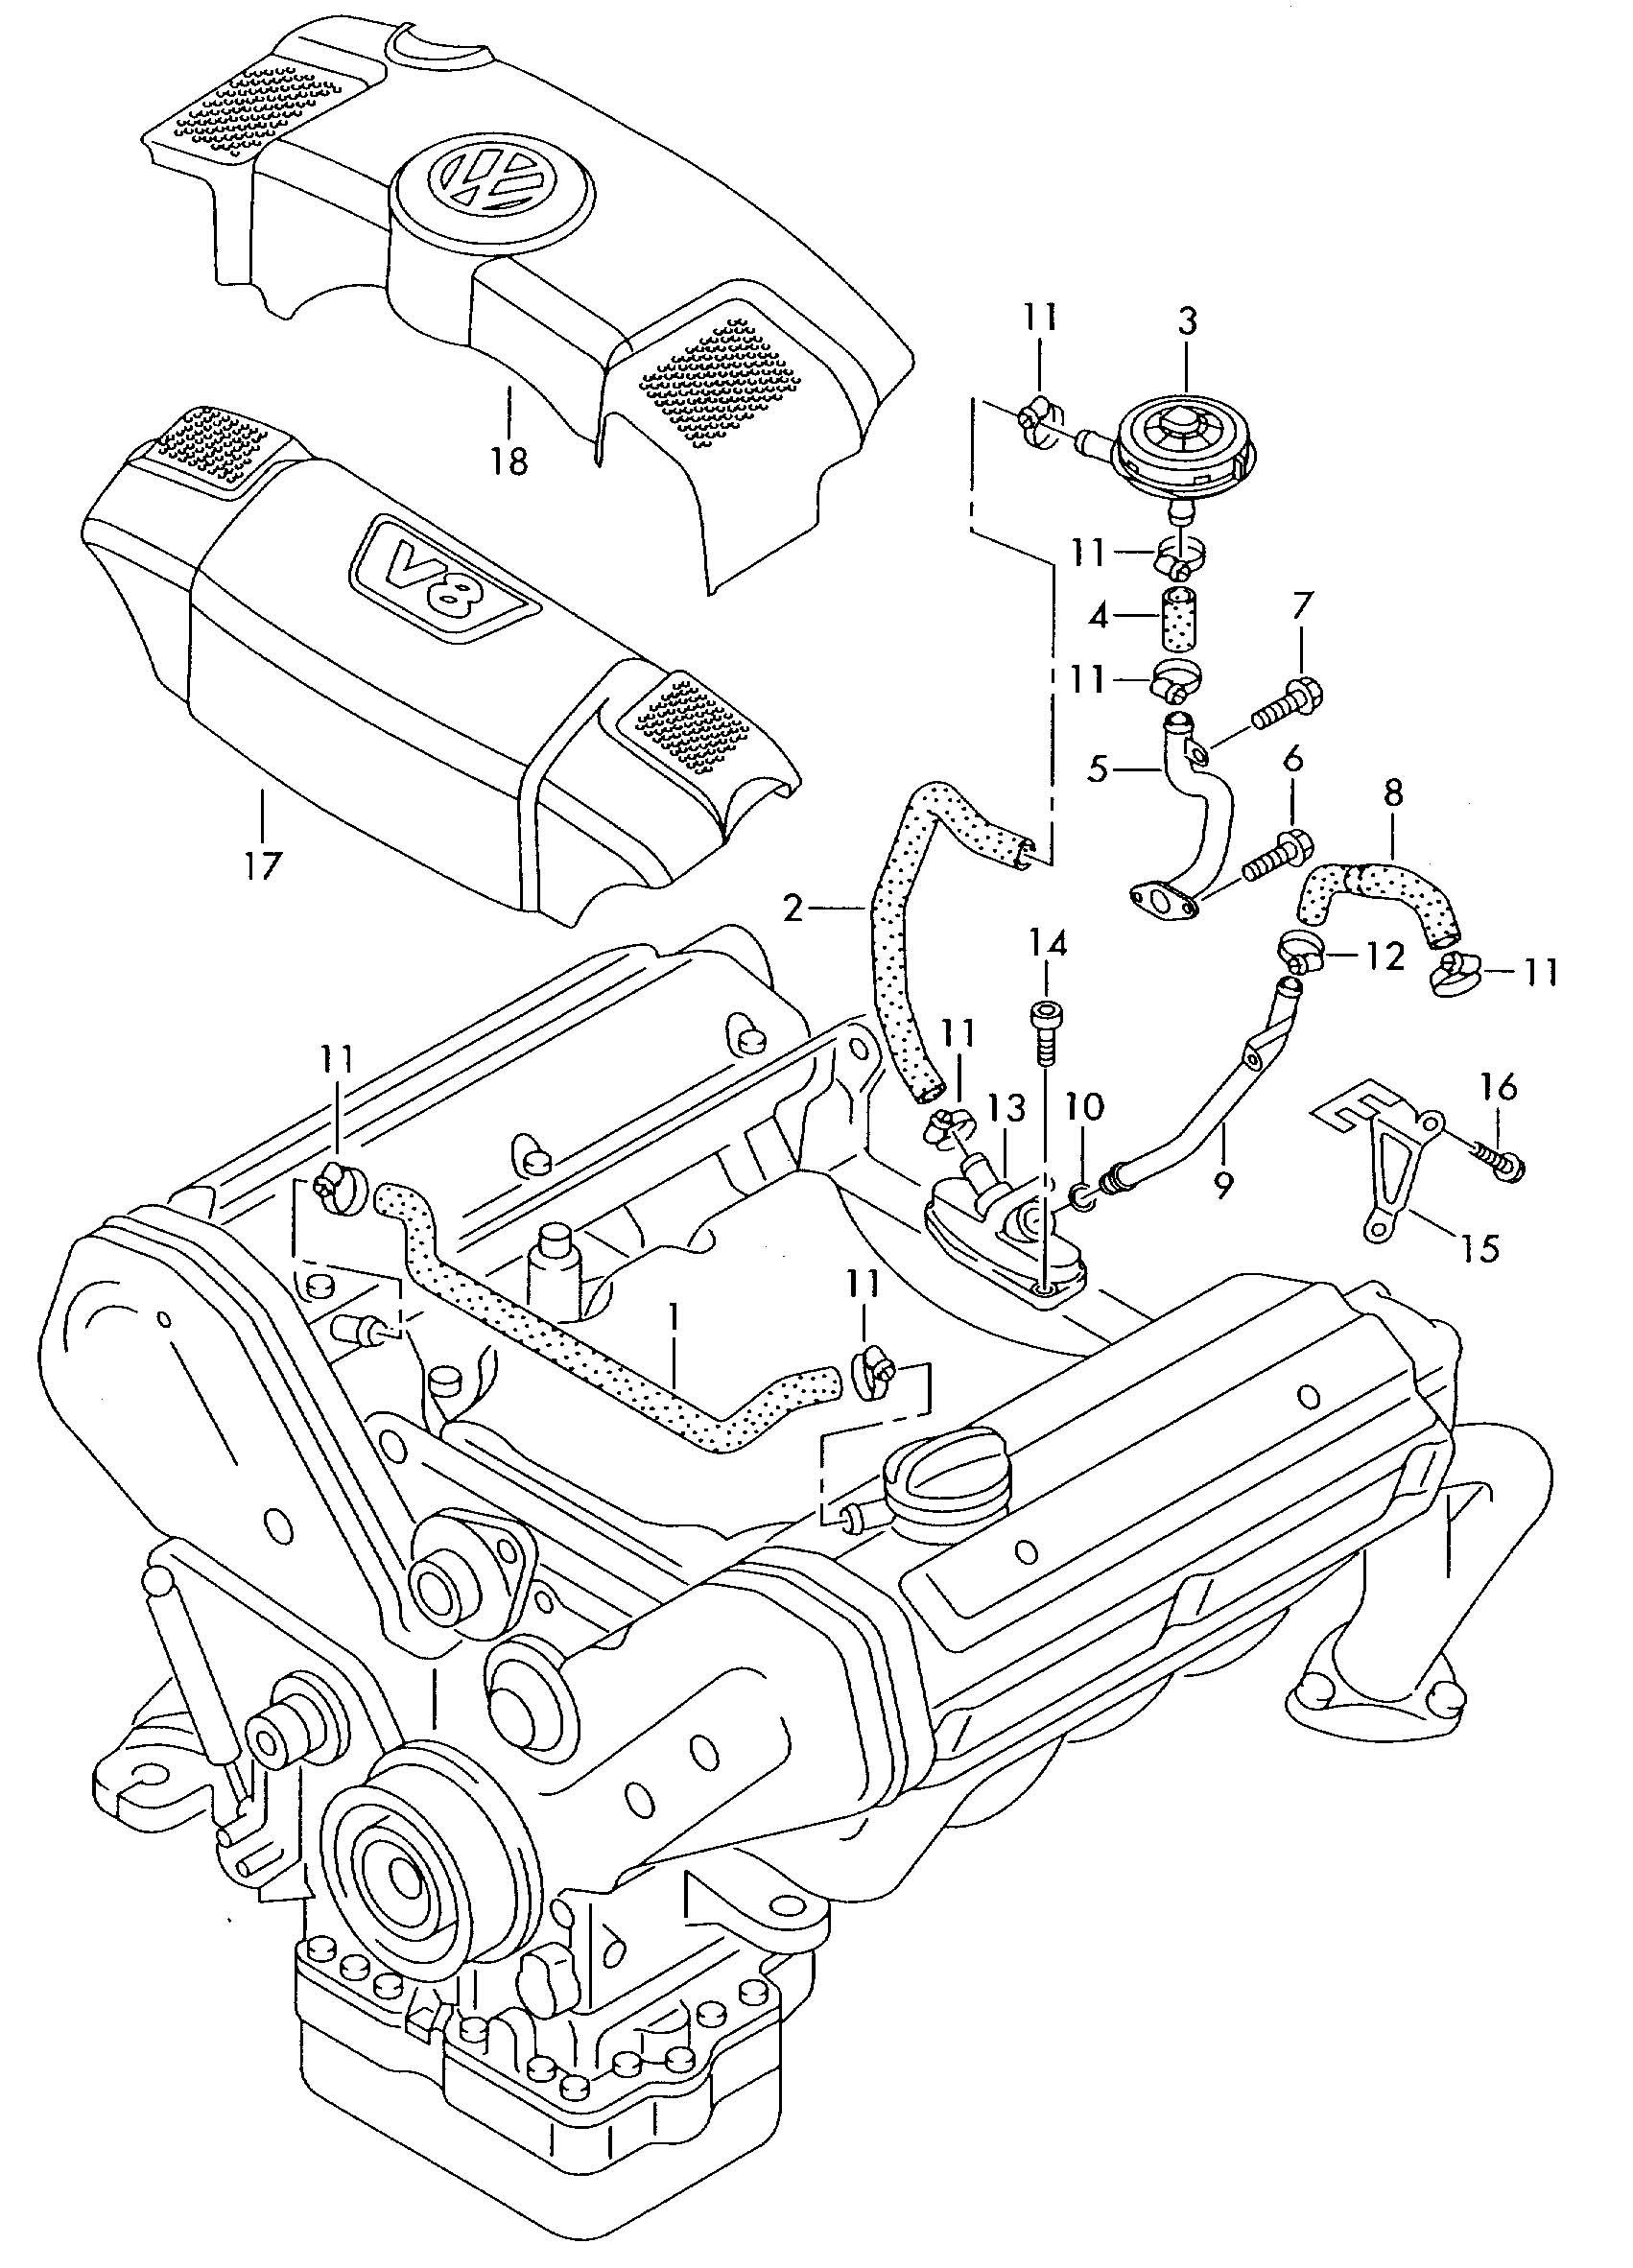 Volkswagen Vw Phaeton Ventilation For Cylinder Block